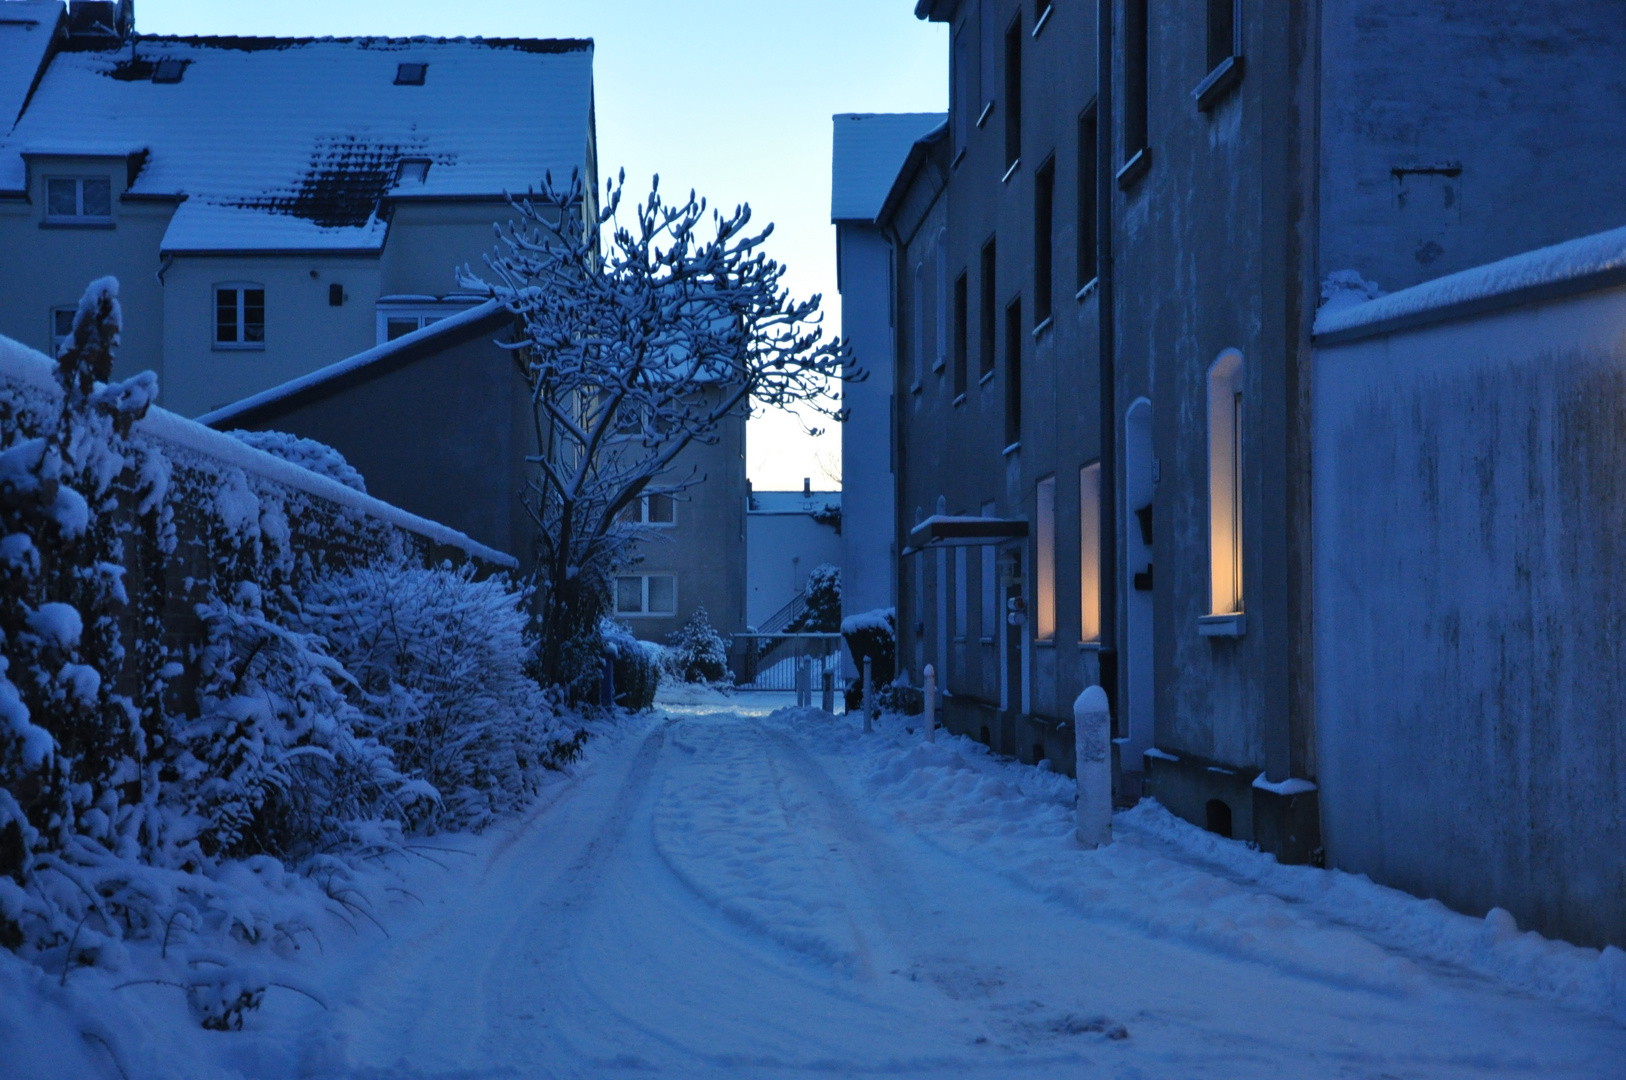 Wintertime 2012